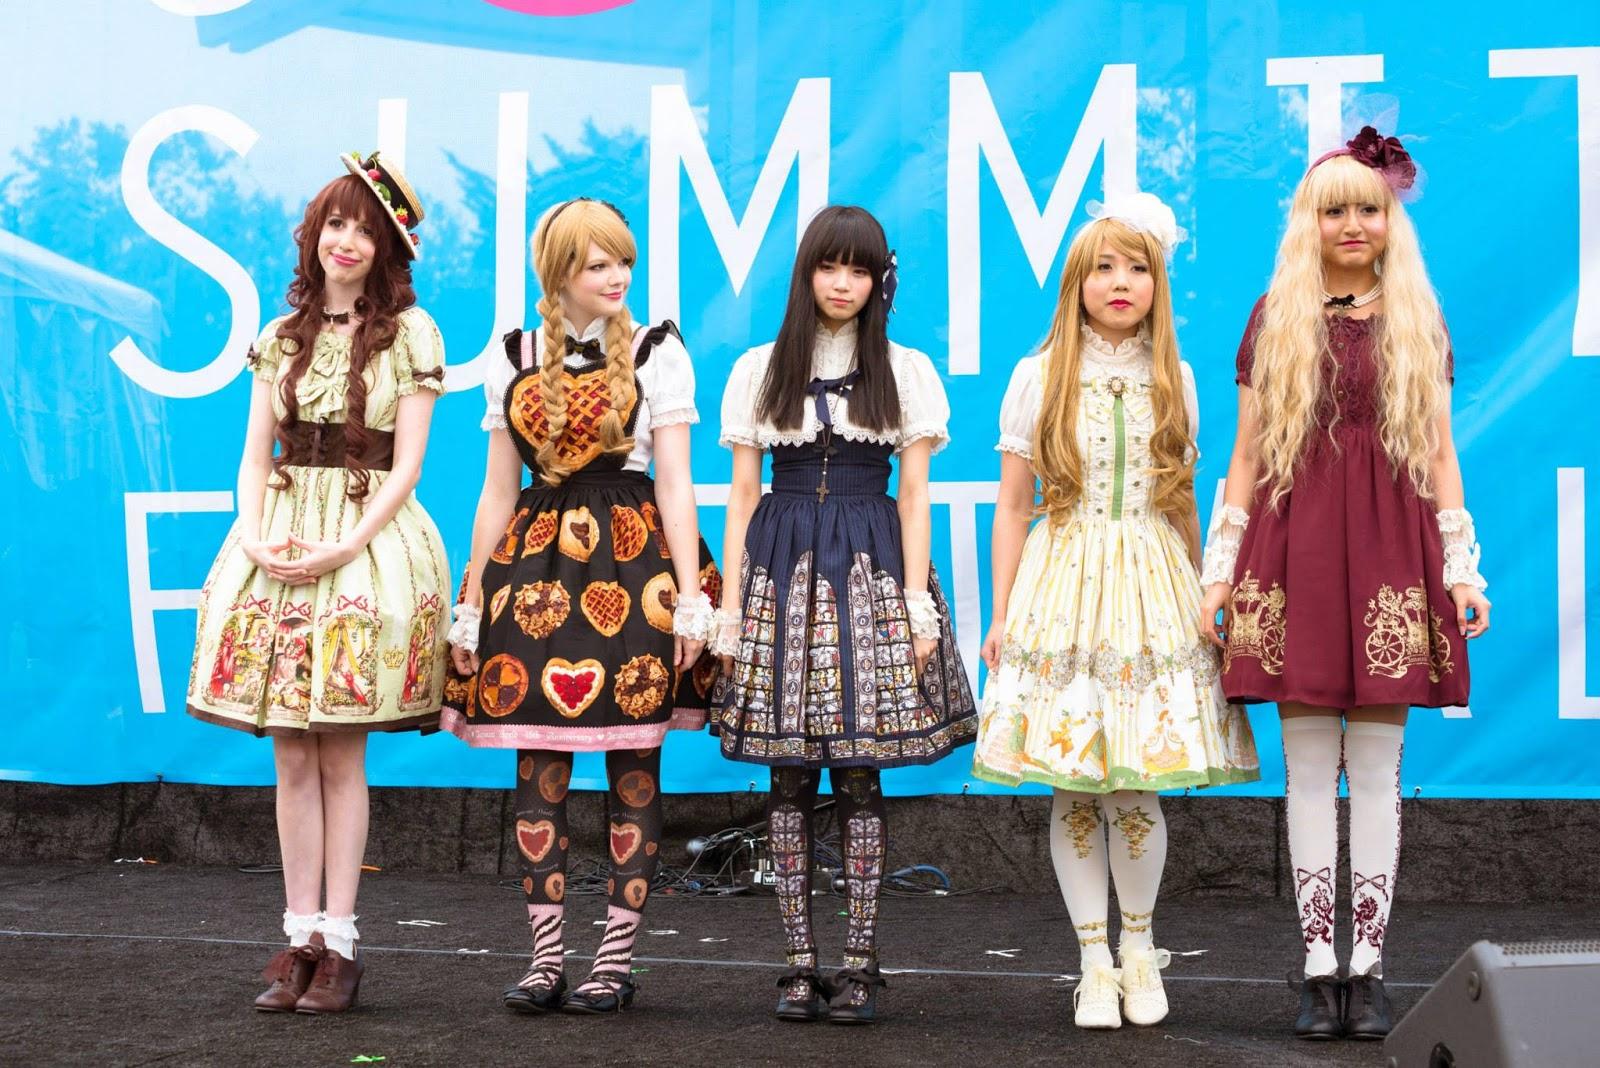 j pop summit, san francisco, harajuku fashion, japan, japanese, lolita, innocent world, fashion show